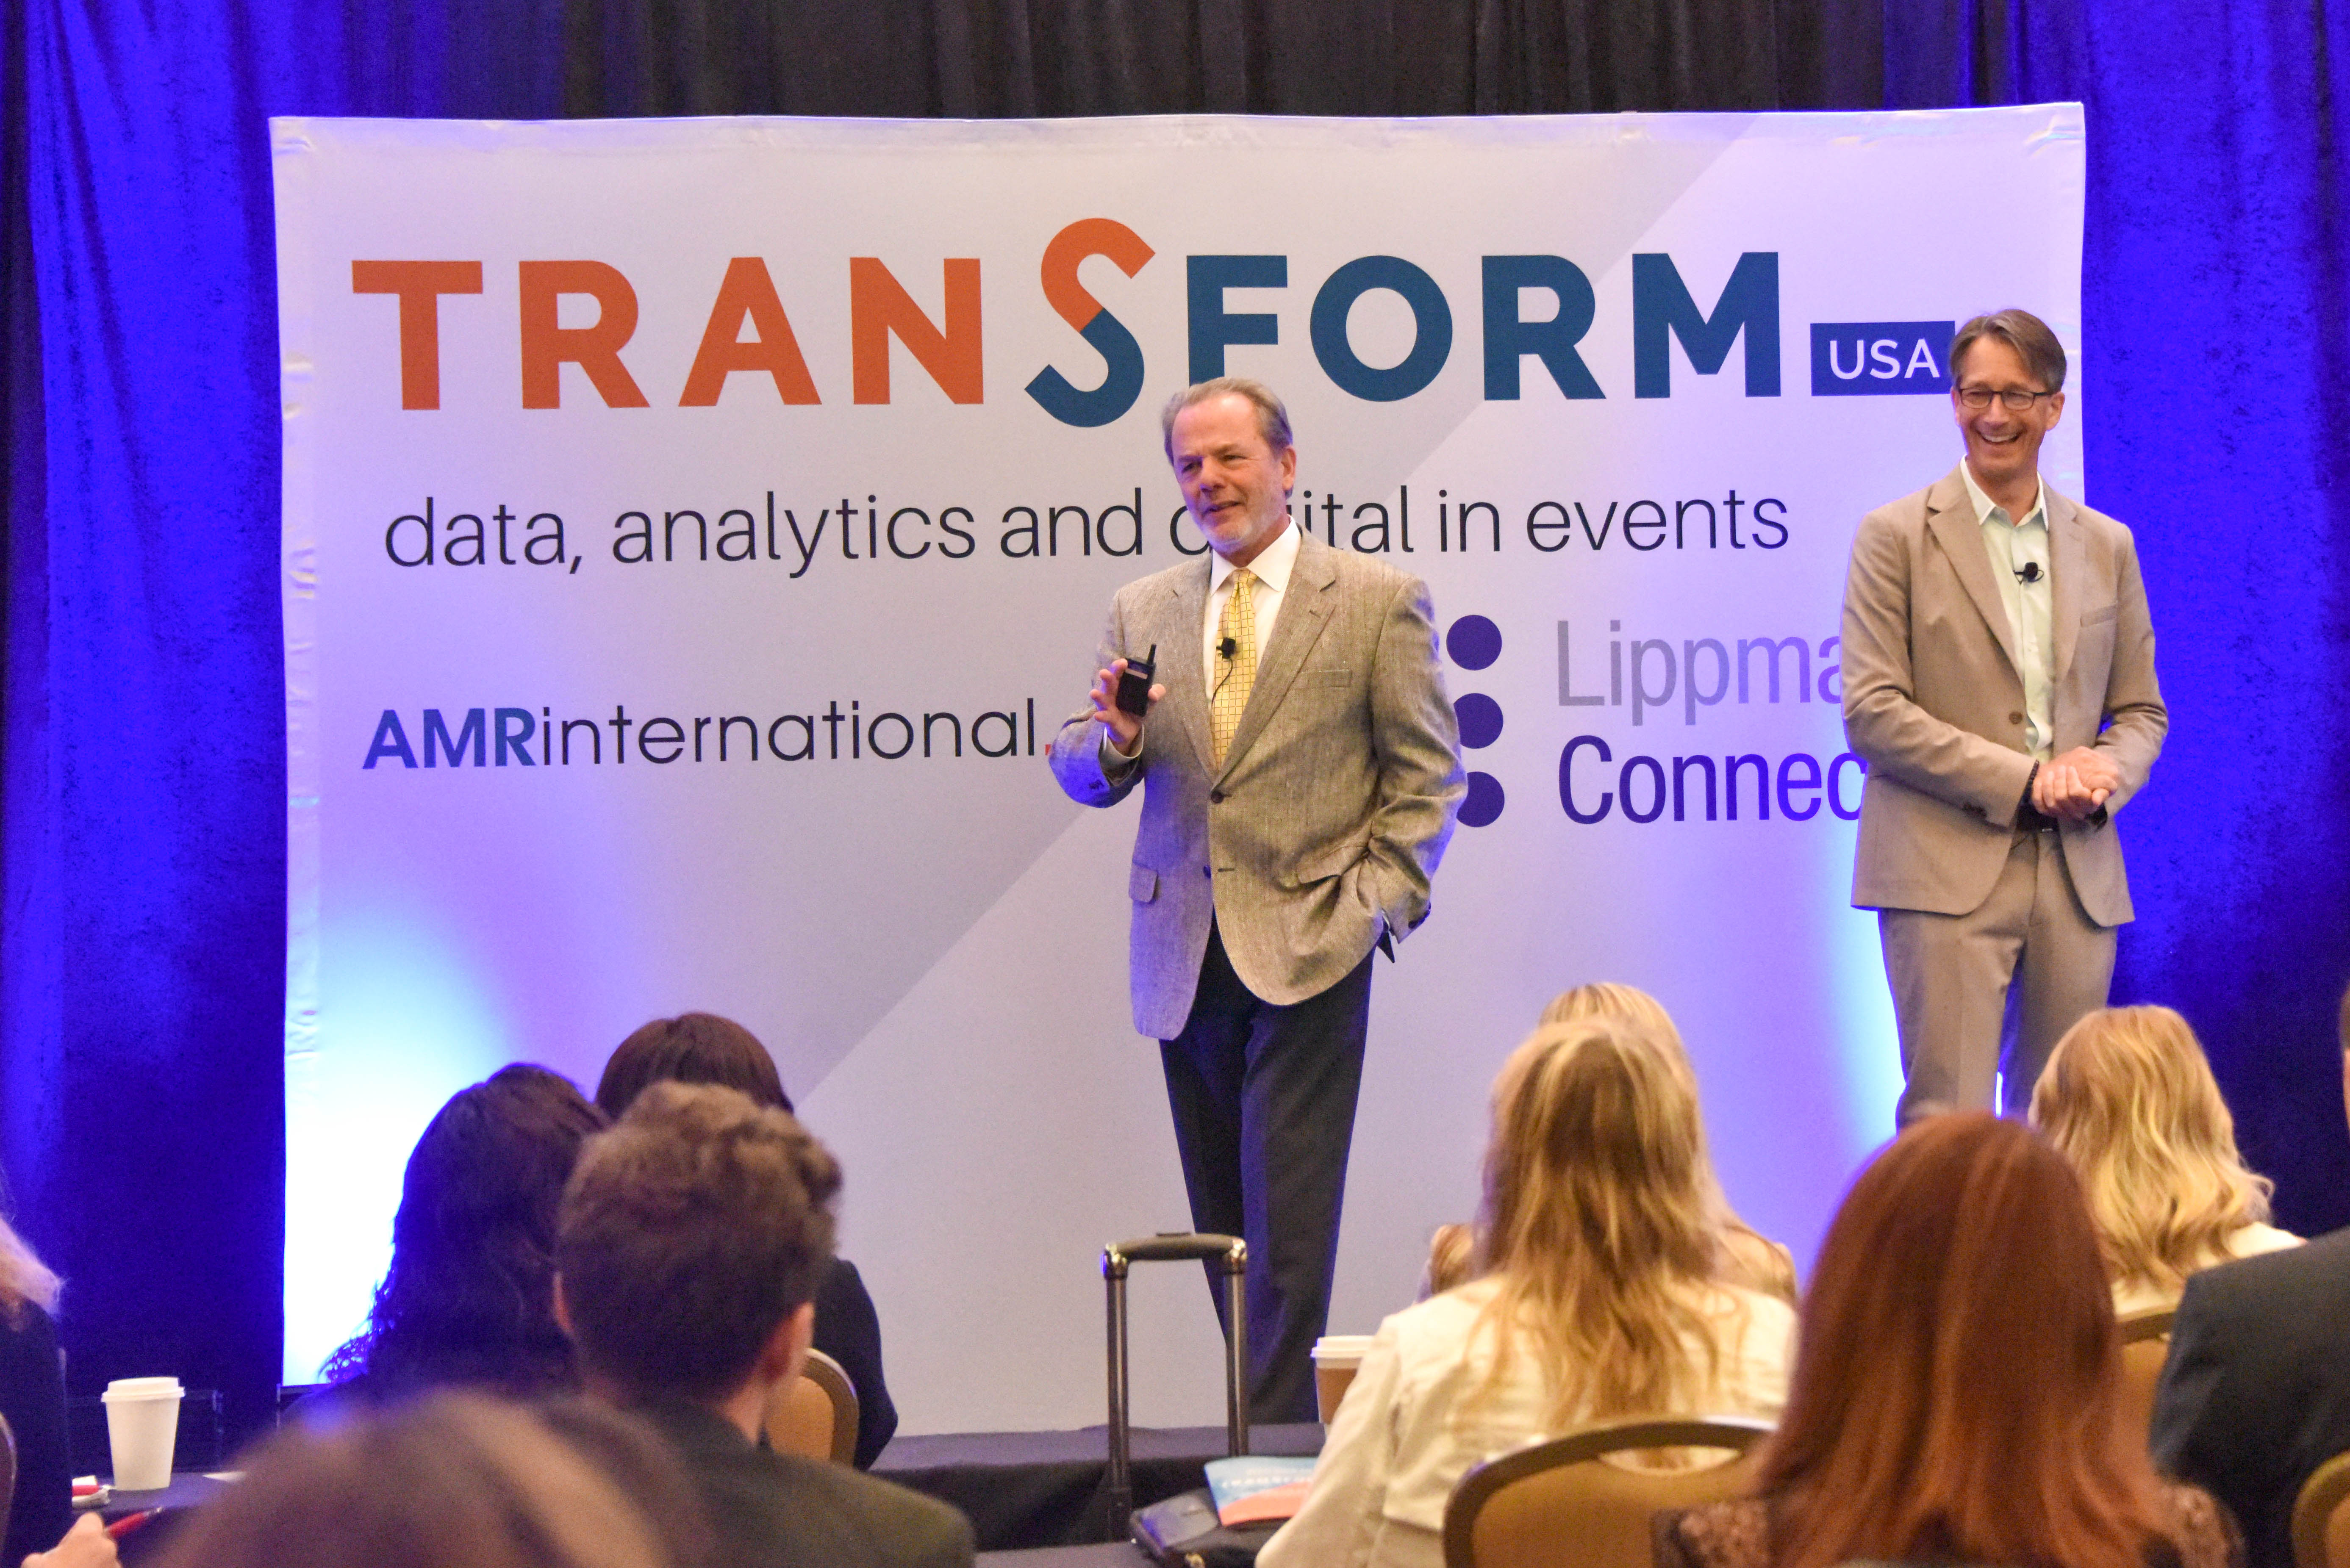 Transform_USA_2017.jpg